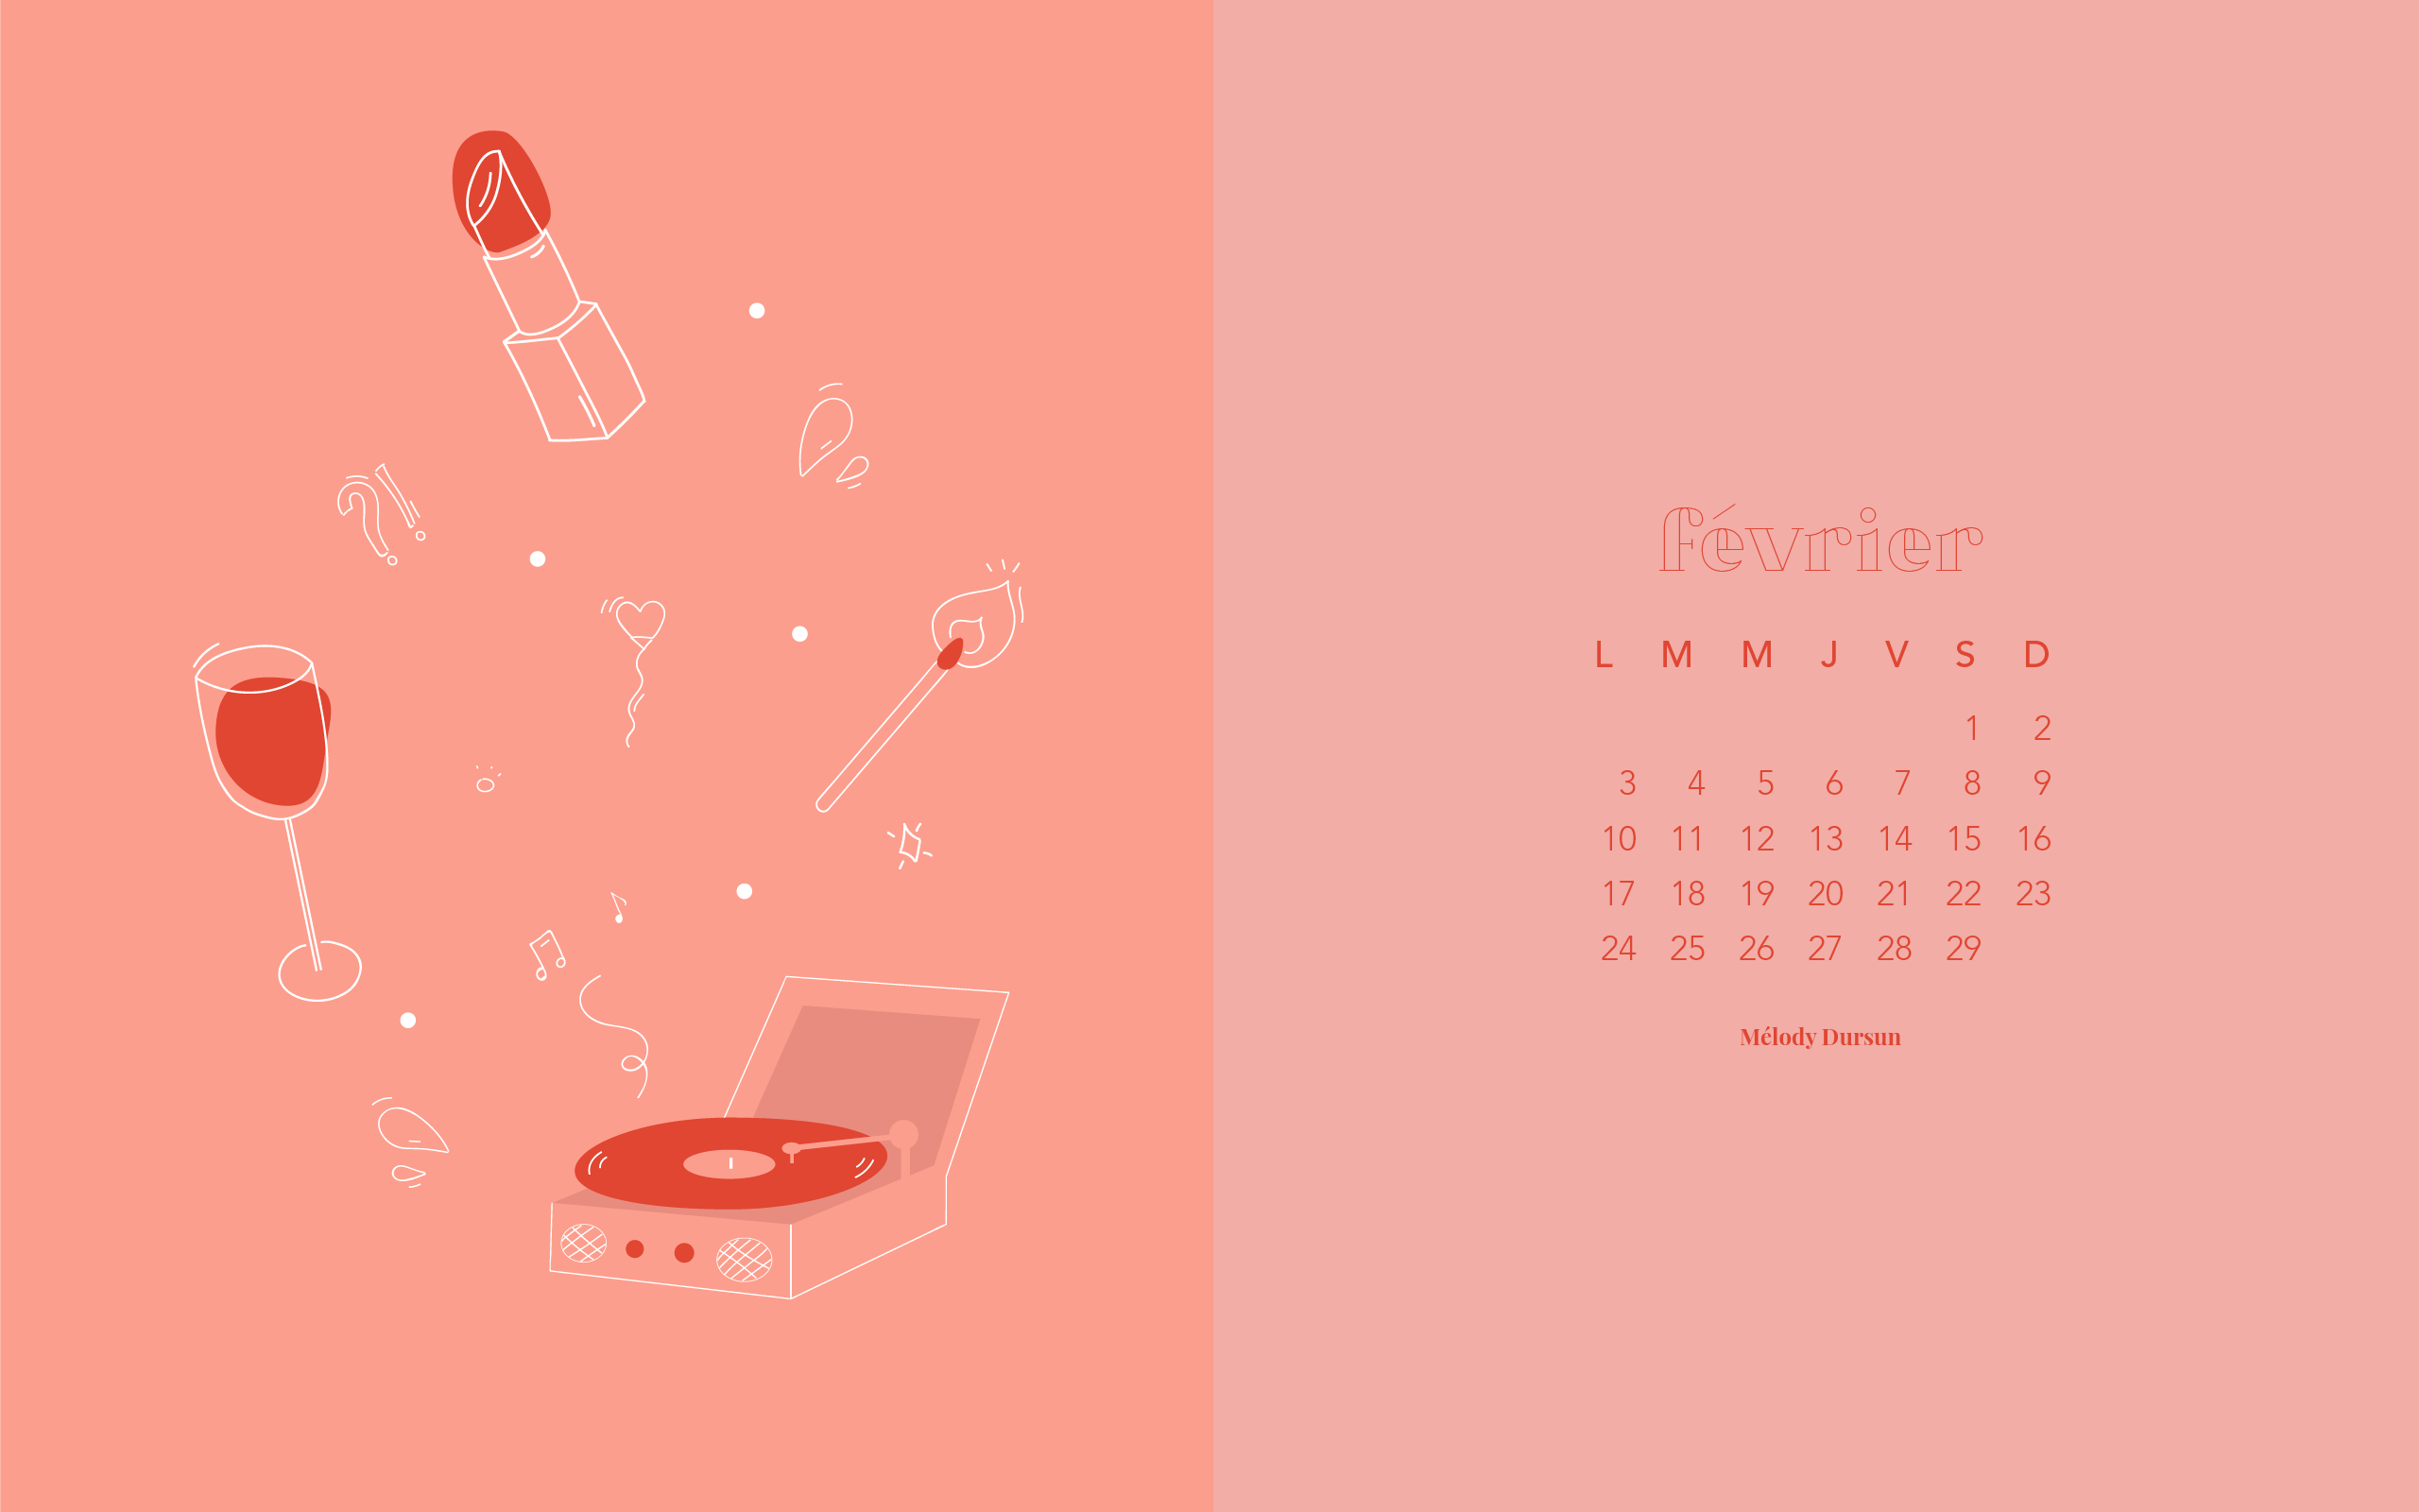 olecoeur-melodydursun-calendrier-fevrier2020_Desktop